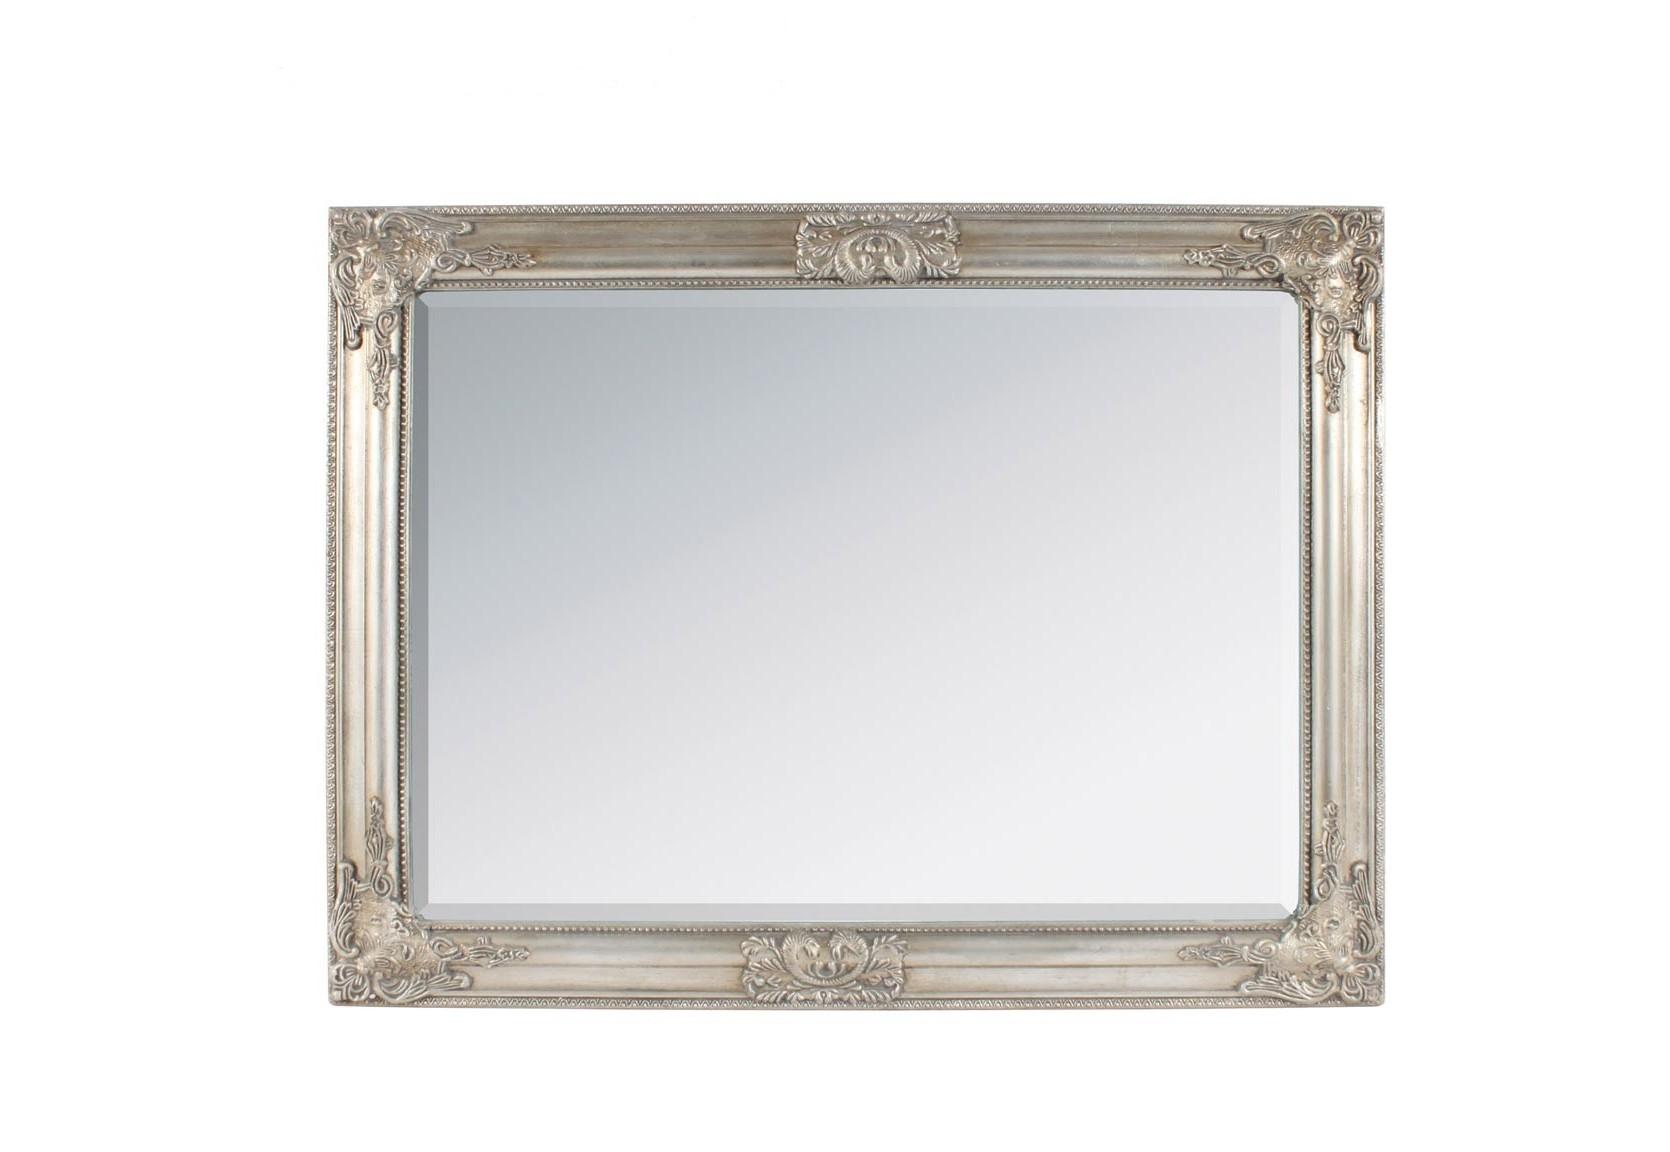 Зеркало настенное Luj?n de CuyoНастенные зеркала<br><br><br>Material: Полистоун